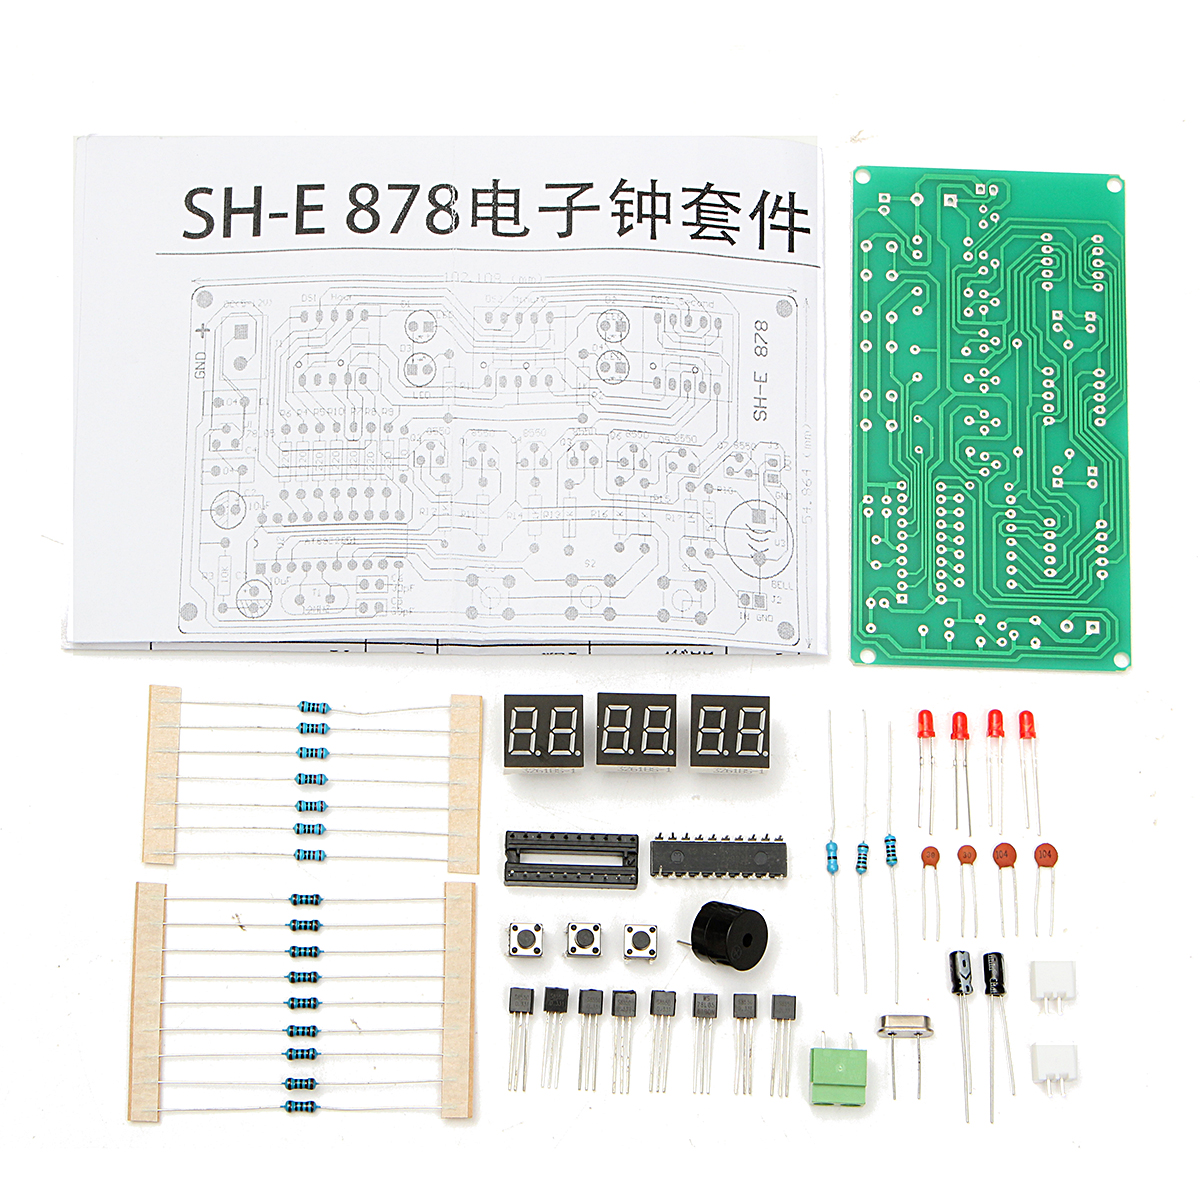 5V-12V AT89C2051 Multi Function Six Digital LED DIY Electronic Clock ...